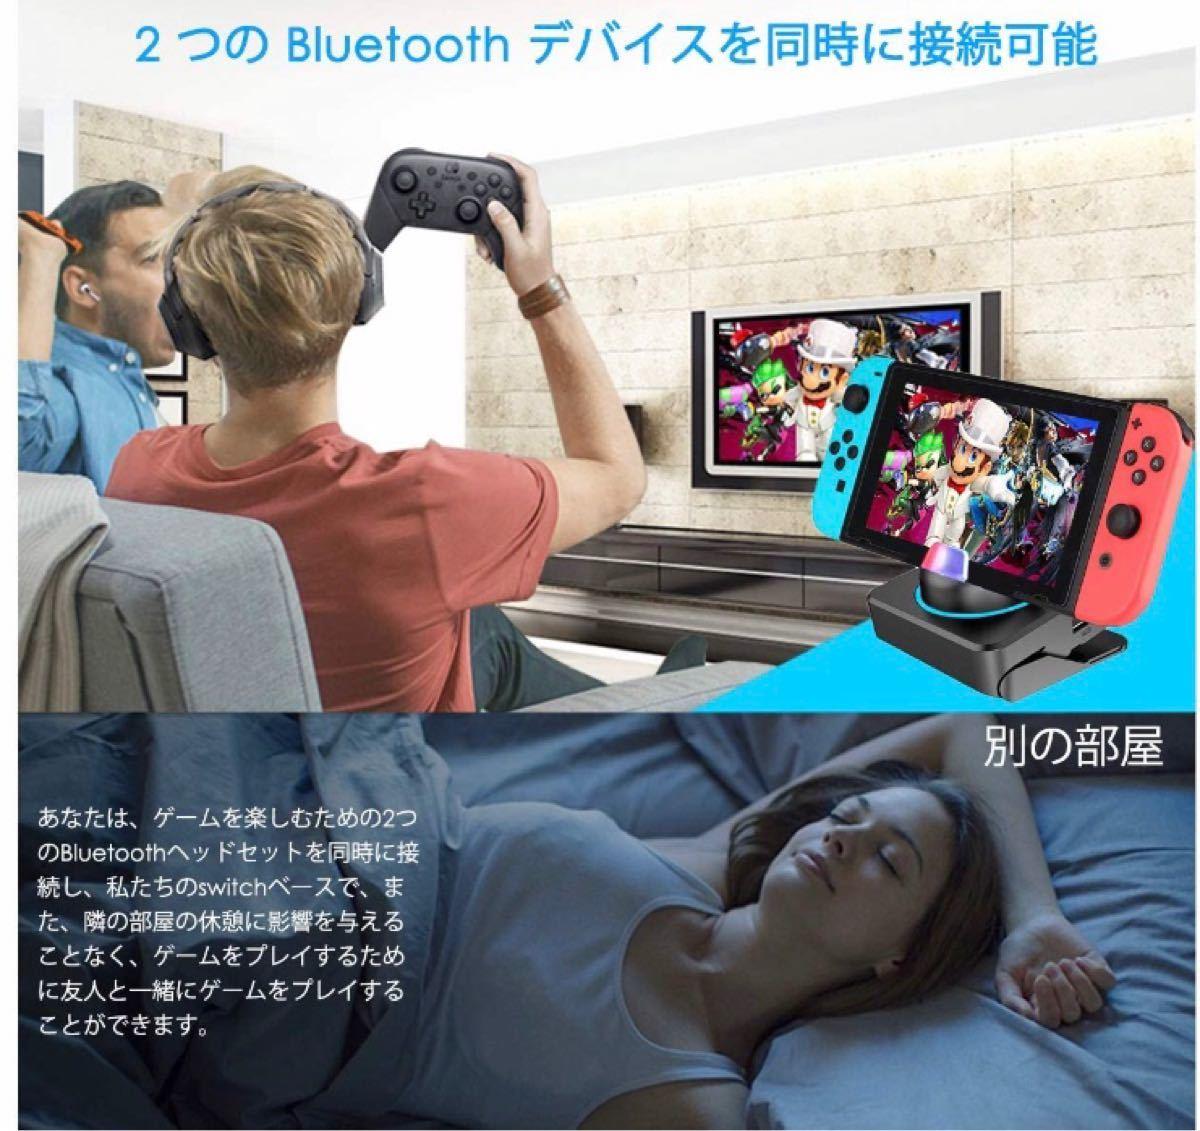 Switchドック 充電スタンド Bluetooth機能 最新システム対応角度